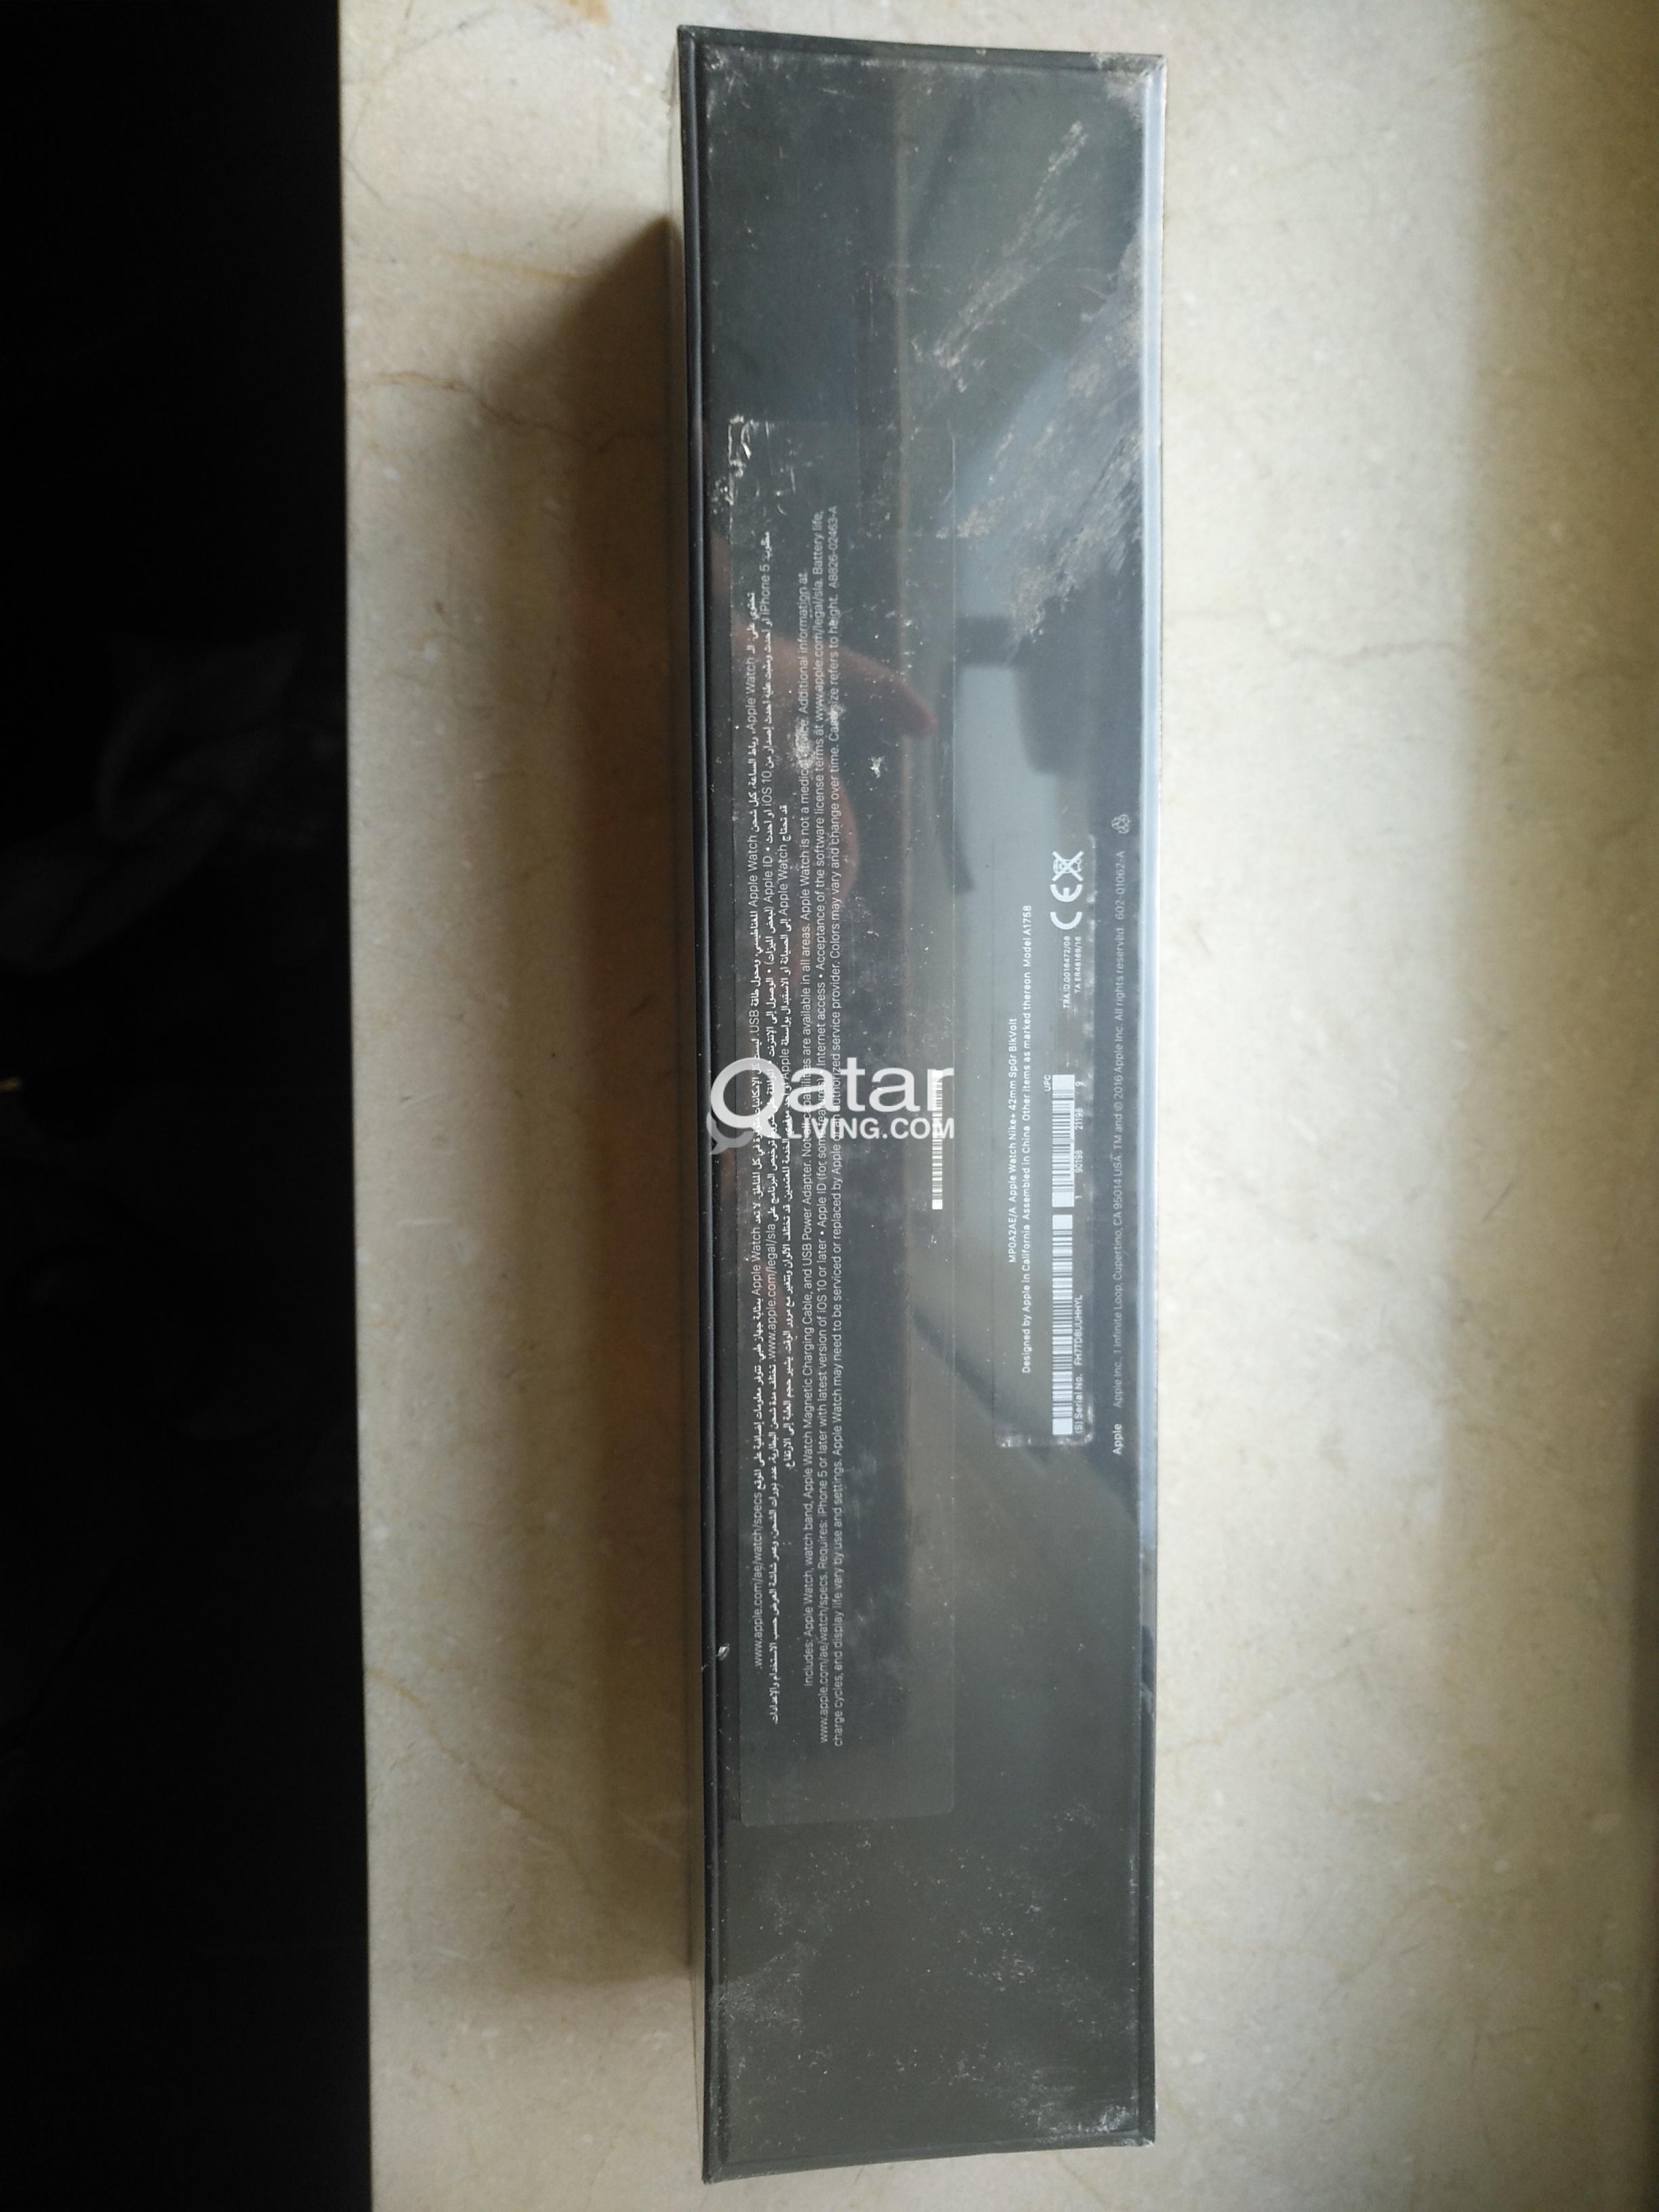 Arqueólogo dulce luz de sol  Apple Watch Series 2 | Qatar Living